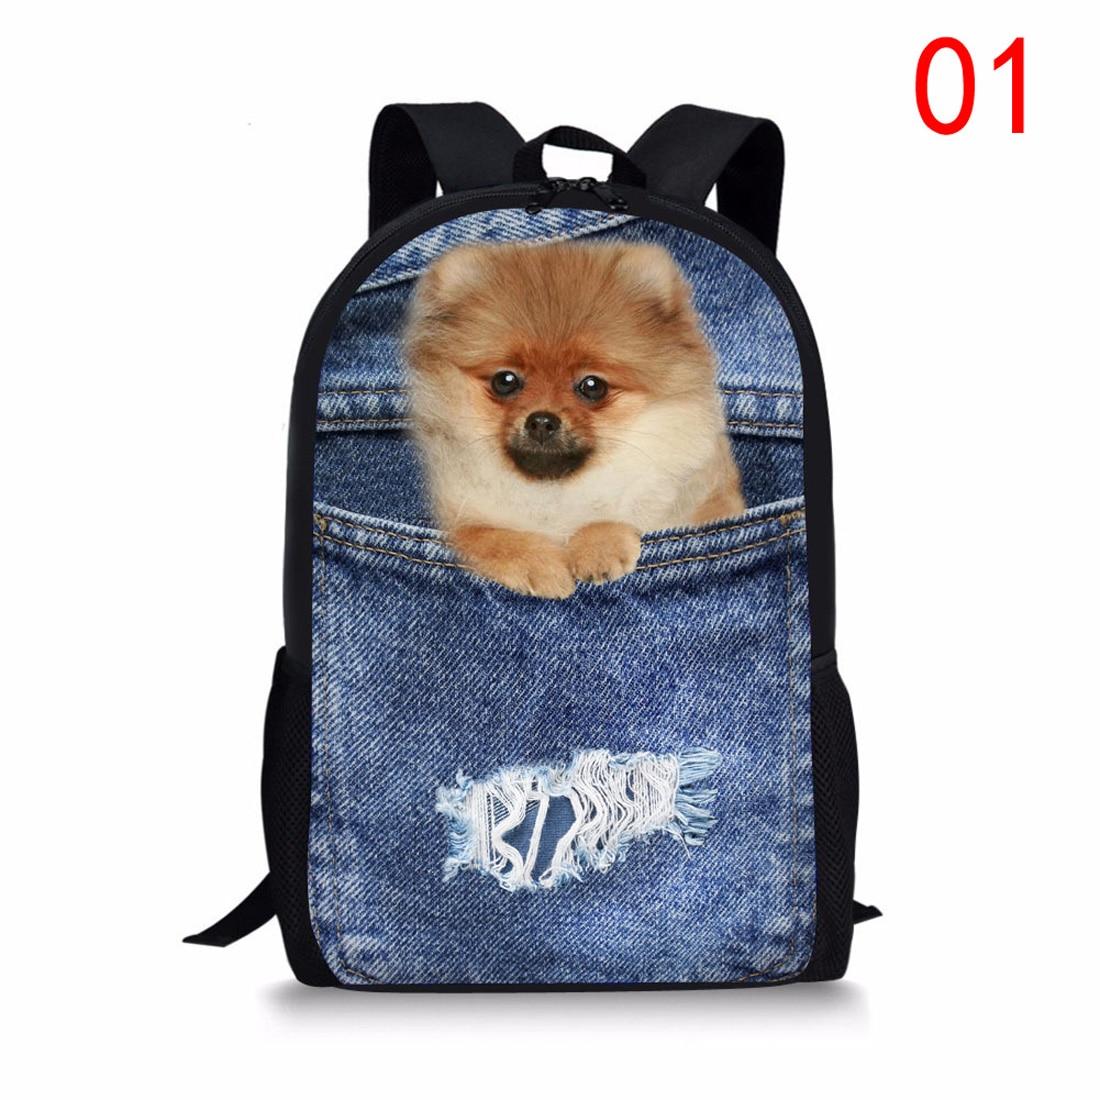 New 2017 Cool Printing Denim Cat Dog Backpack for Children High Primary School Student Kids Backpack Teen Boys Girls Bookbags